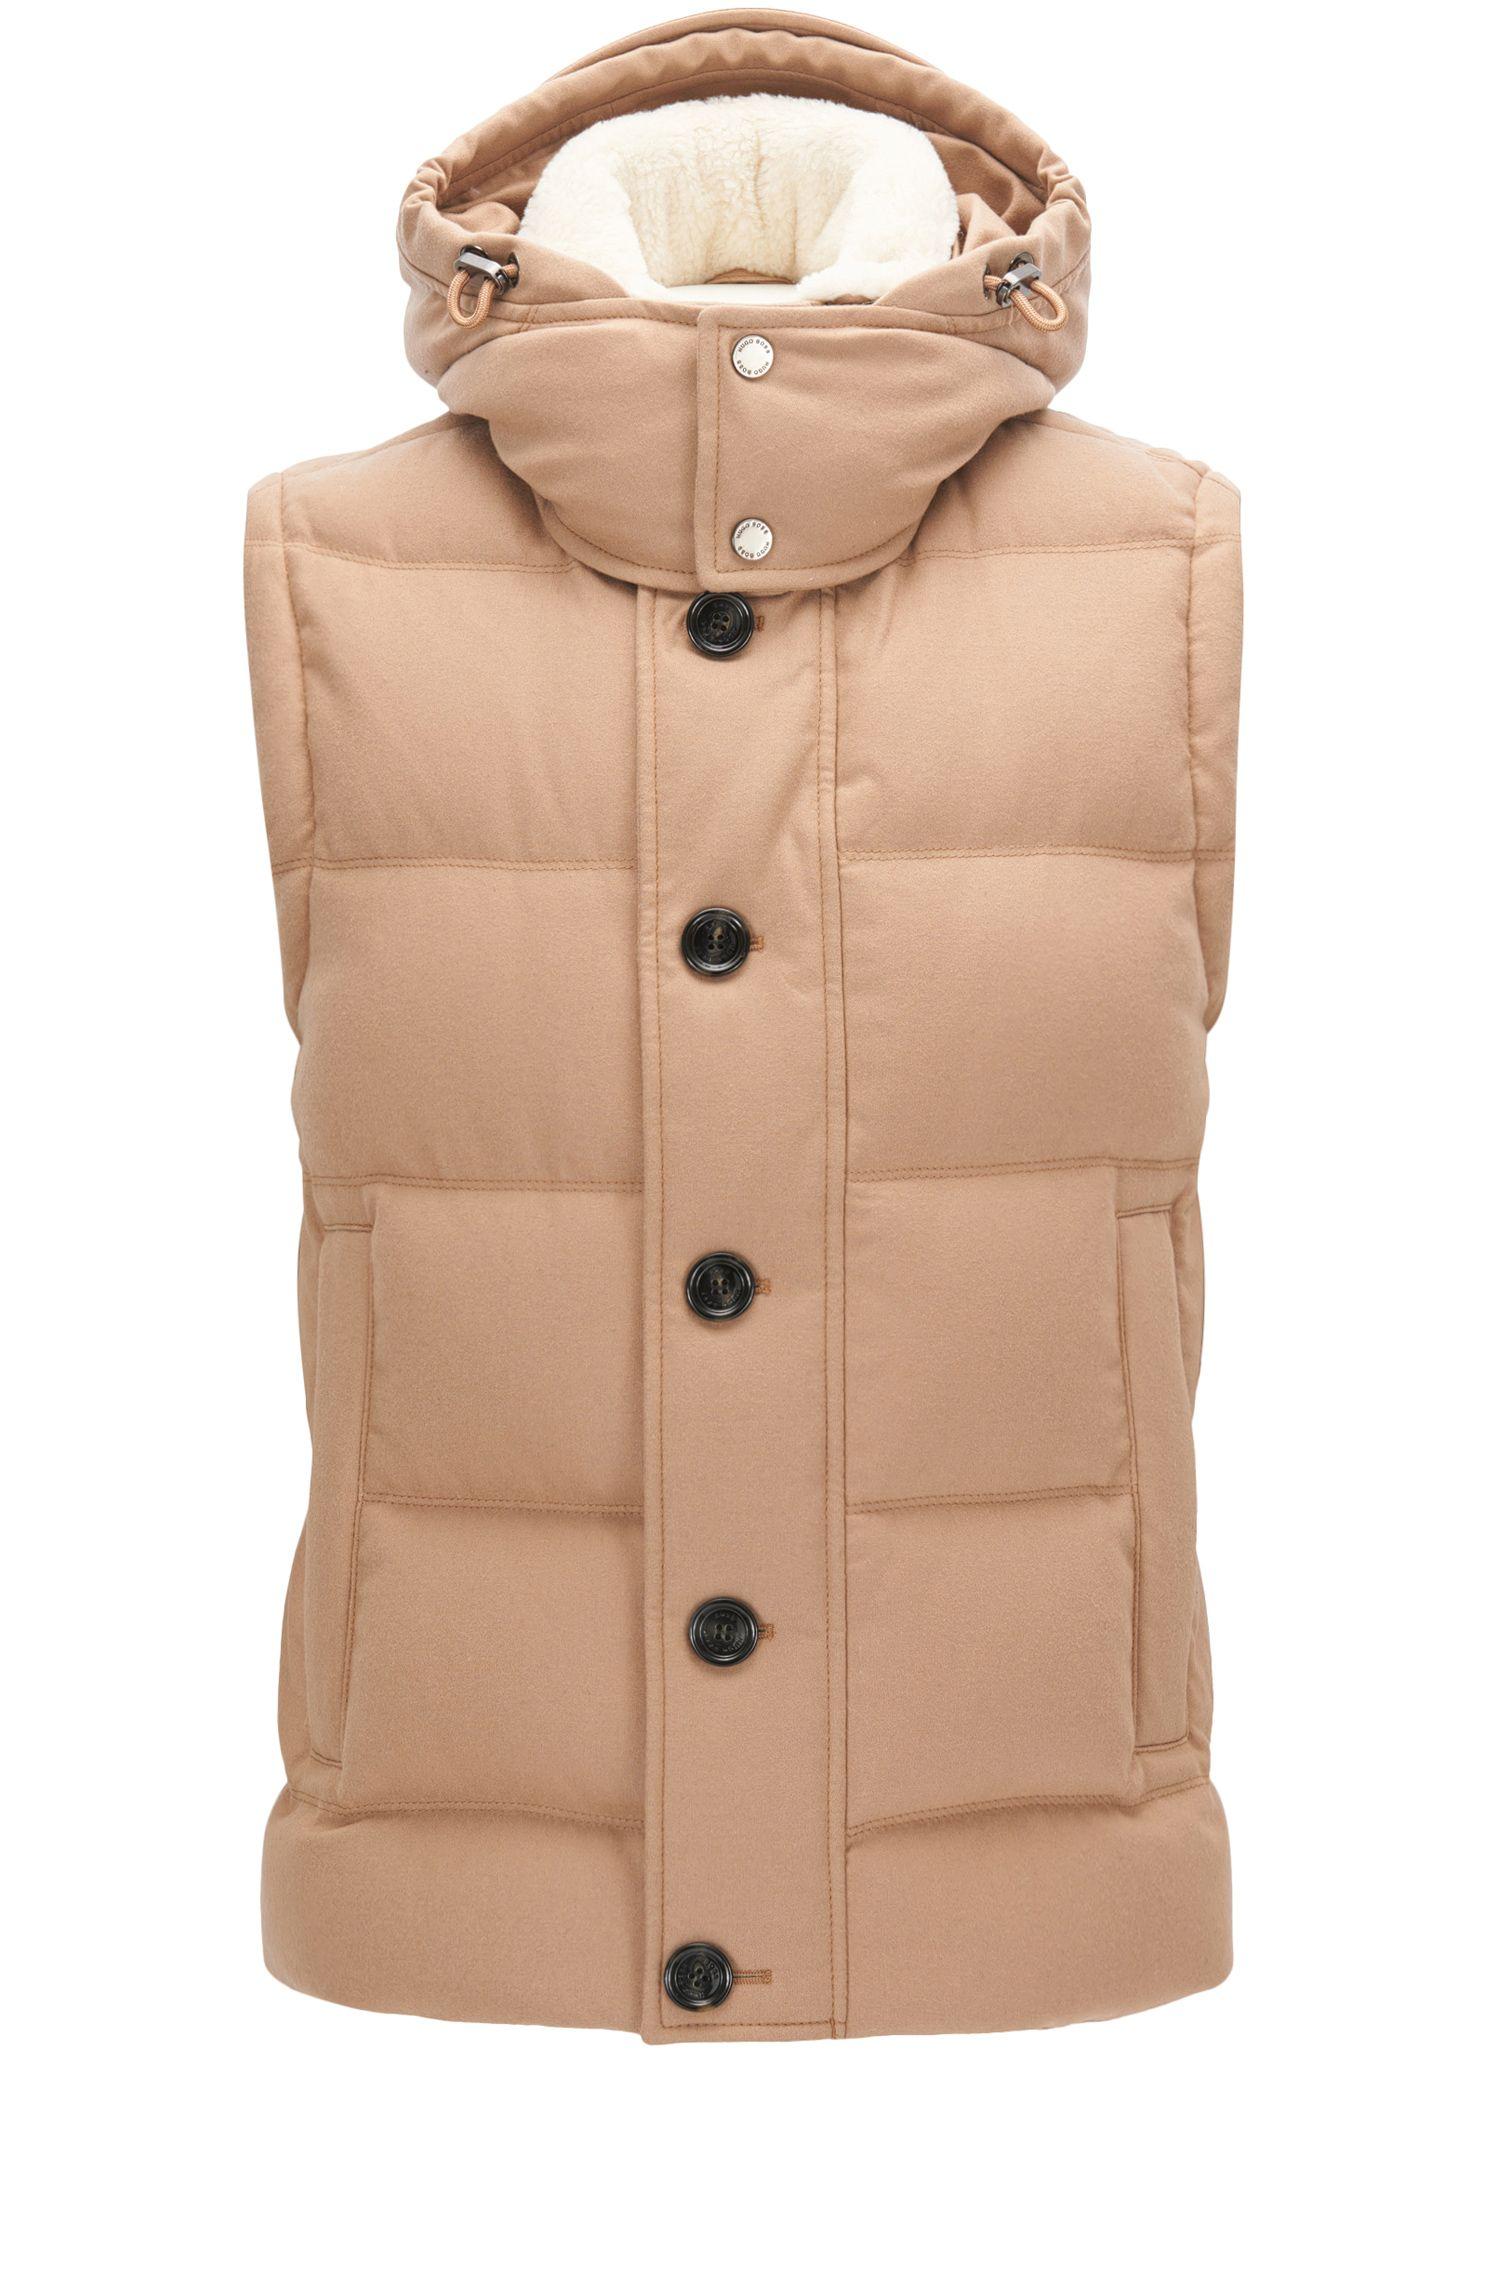 Virgin Wool Cashmere Blend Puffer Vest | T-Denis